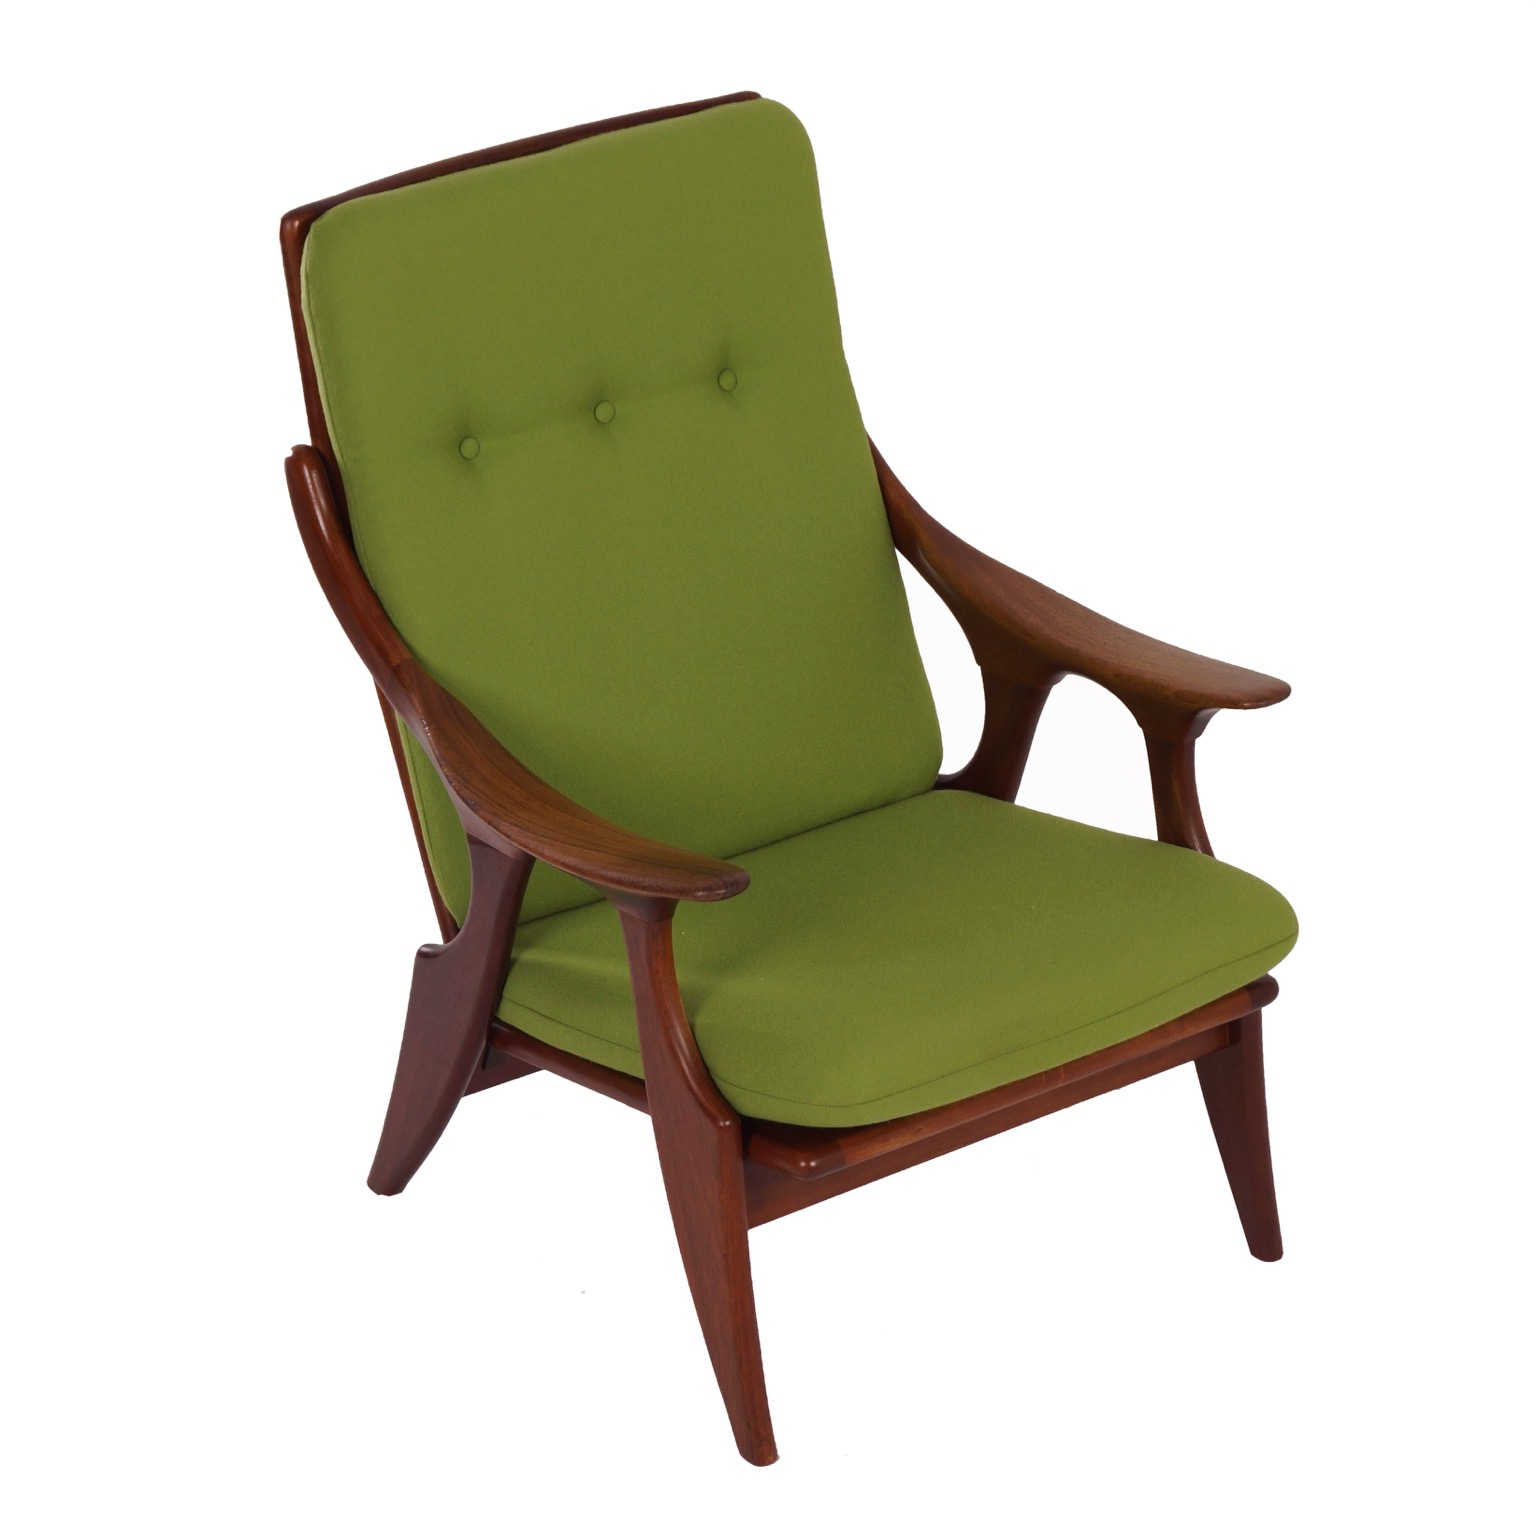 Teak easy chair by de ster gelderland 1960s vintage design for Easy chair designs